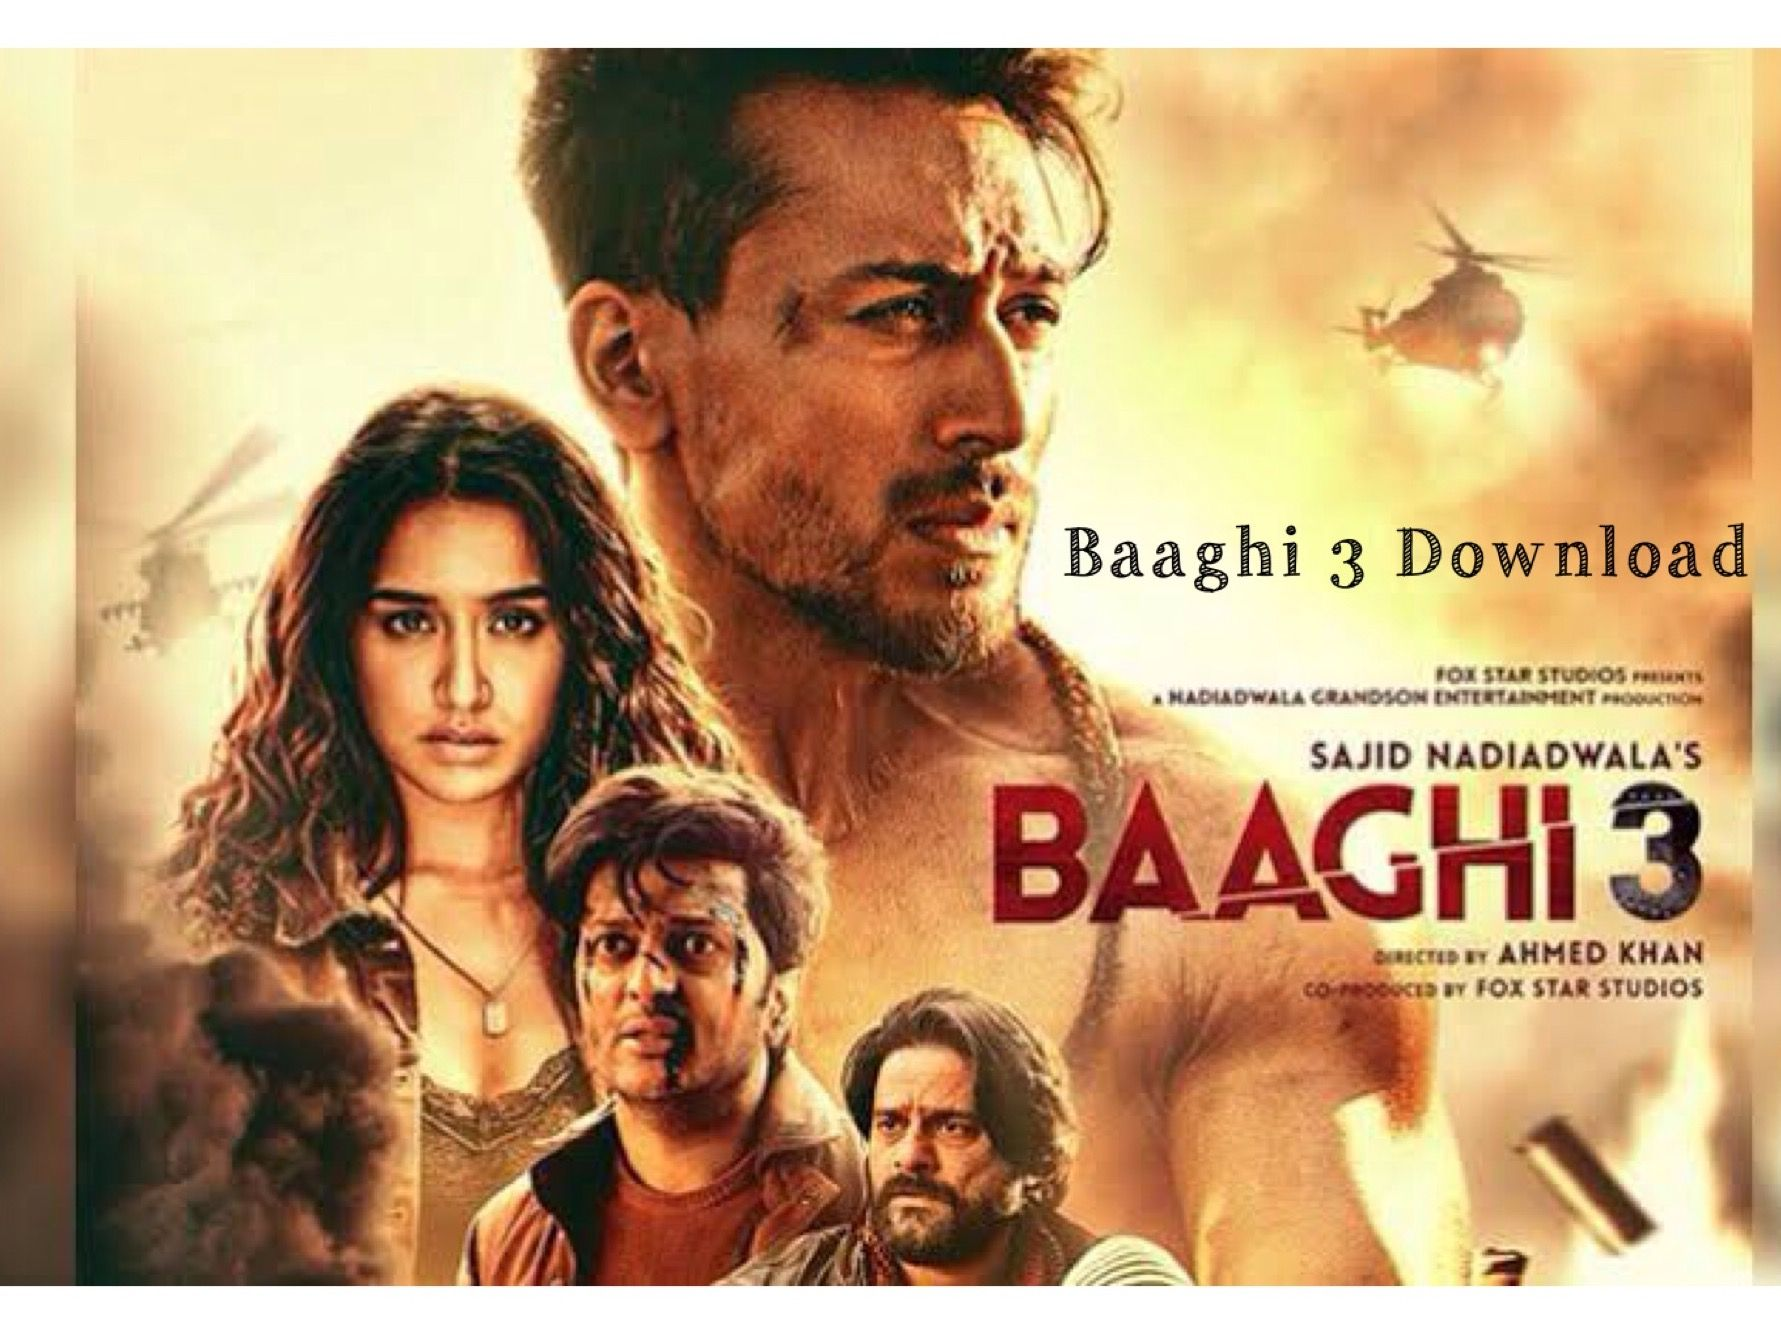 Baaghi 3 Bollywood Movie Cinema Print Download Full Movies Download Full Movies Hindi Movies